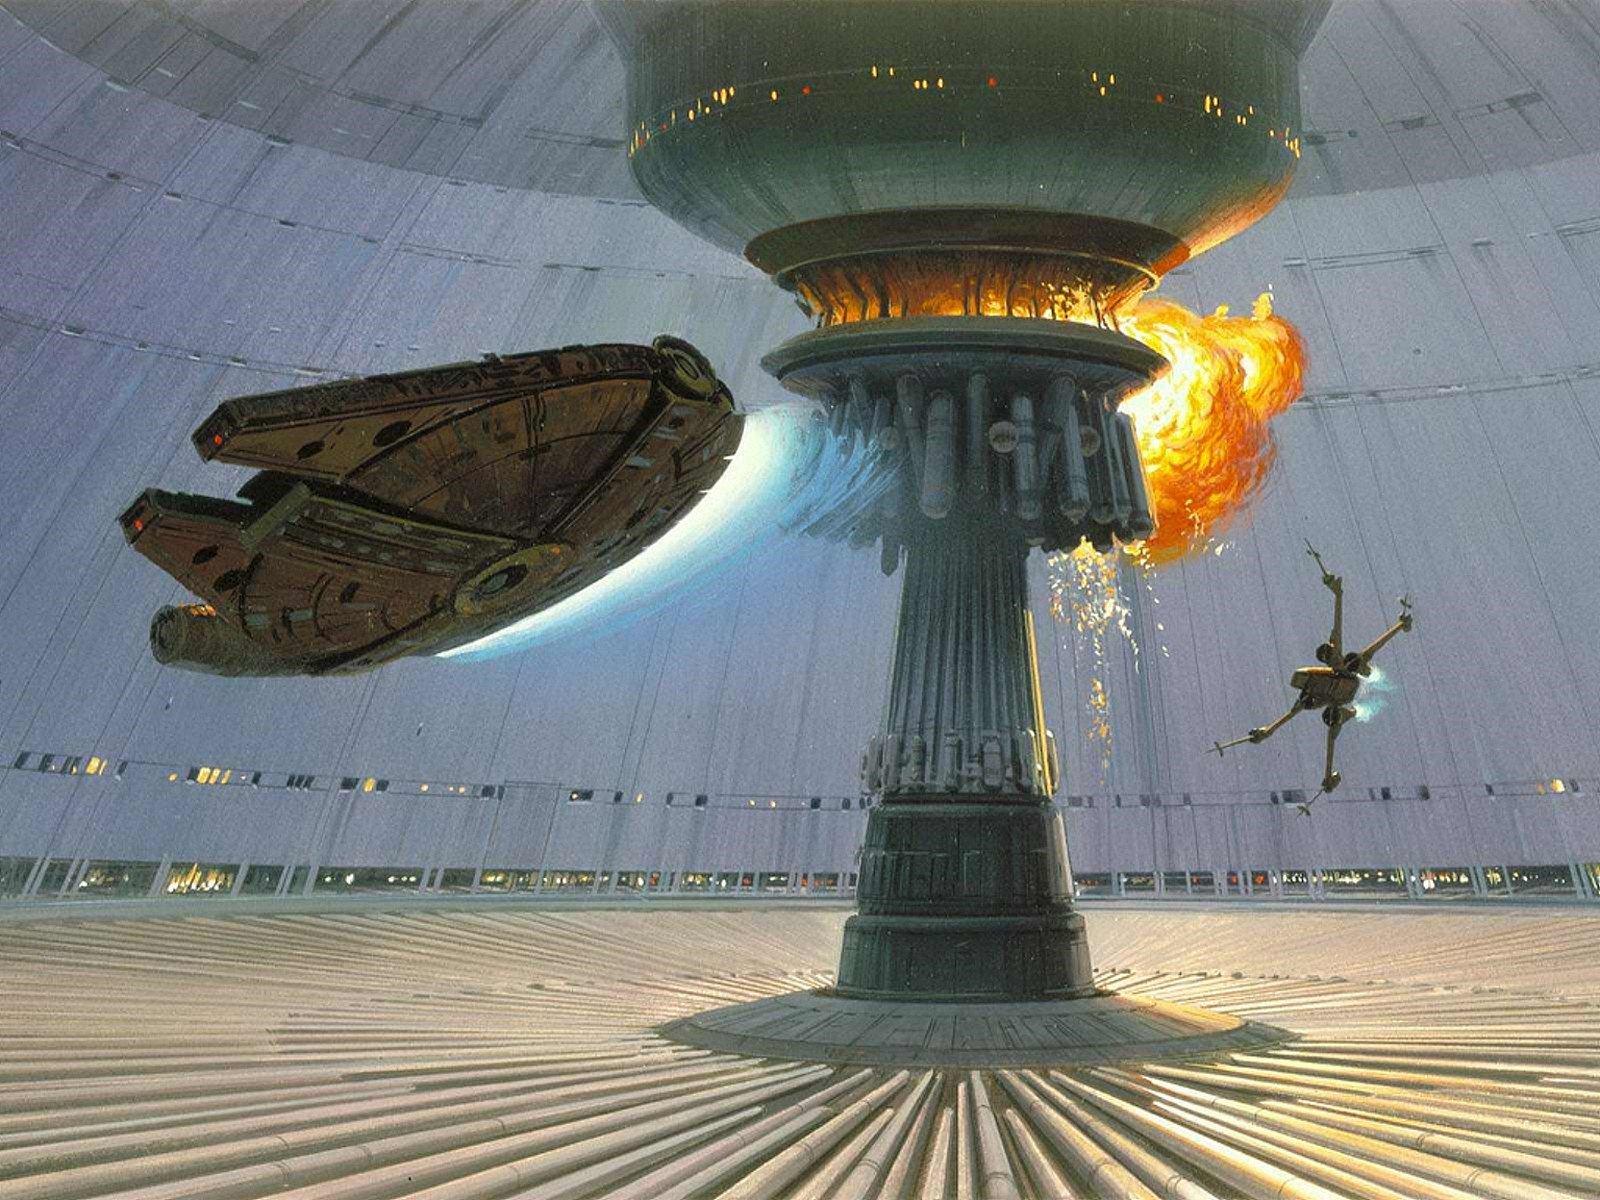 Star Wars explosions Death Star Millennium Falcon X Wing concept art 1600x1200